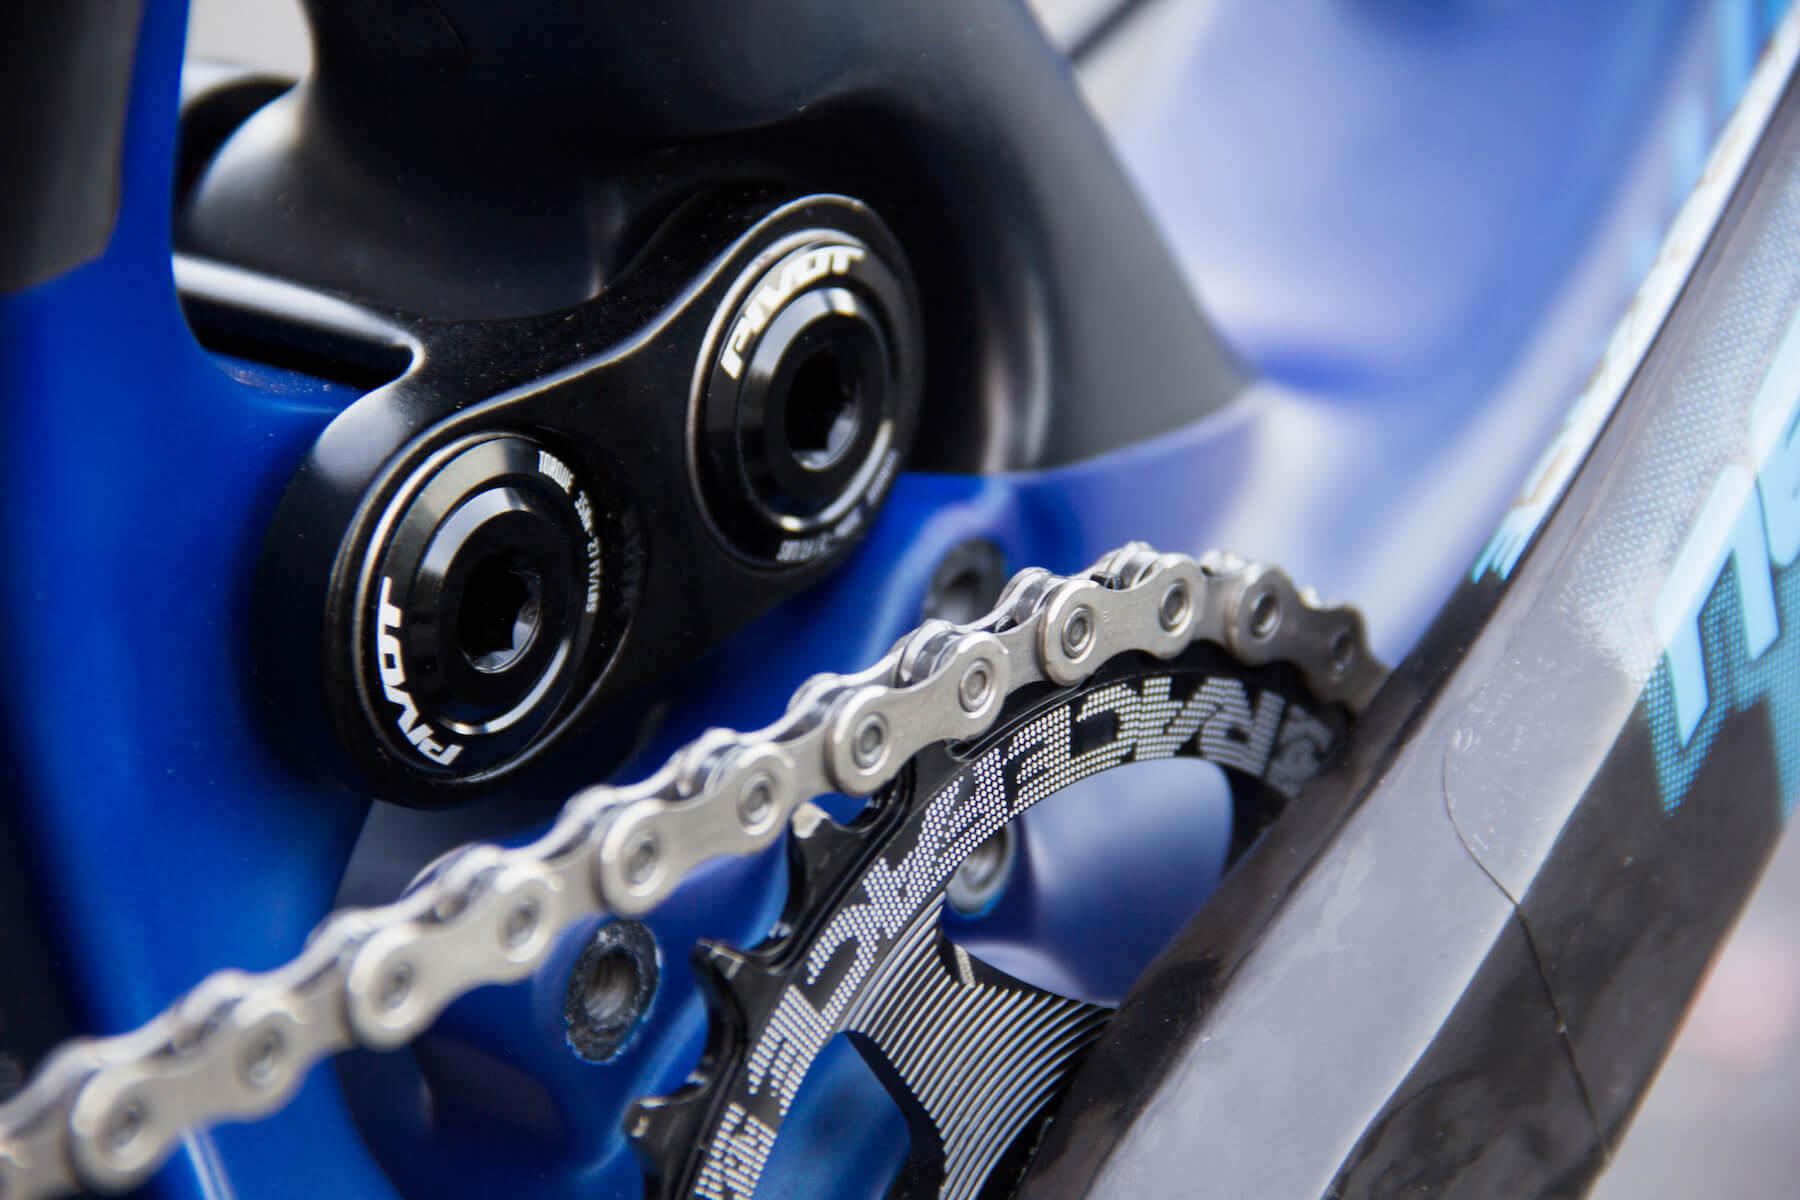 Pivot 5.5 Anniversary Edition - Race Face Next SL Cranks